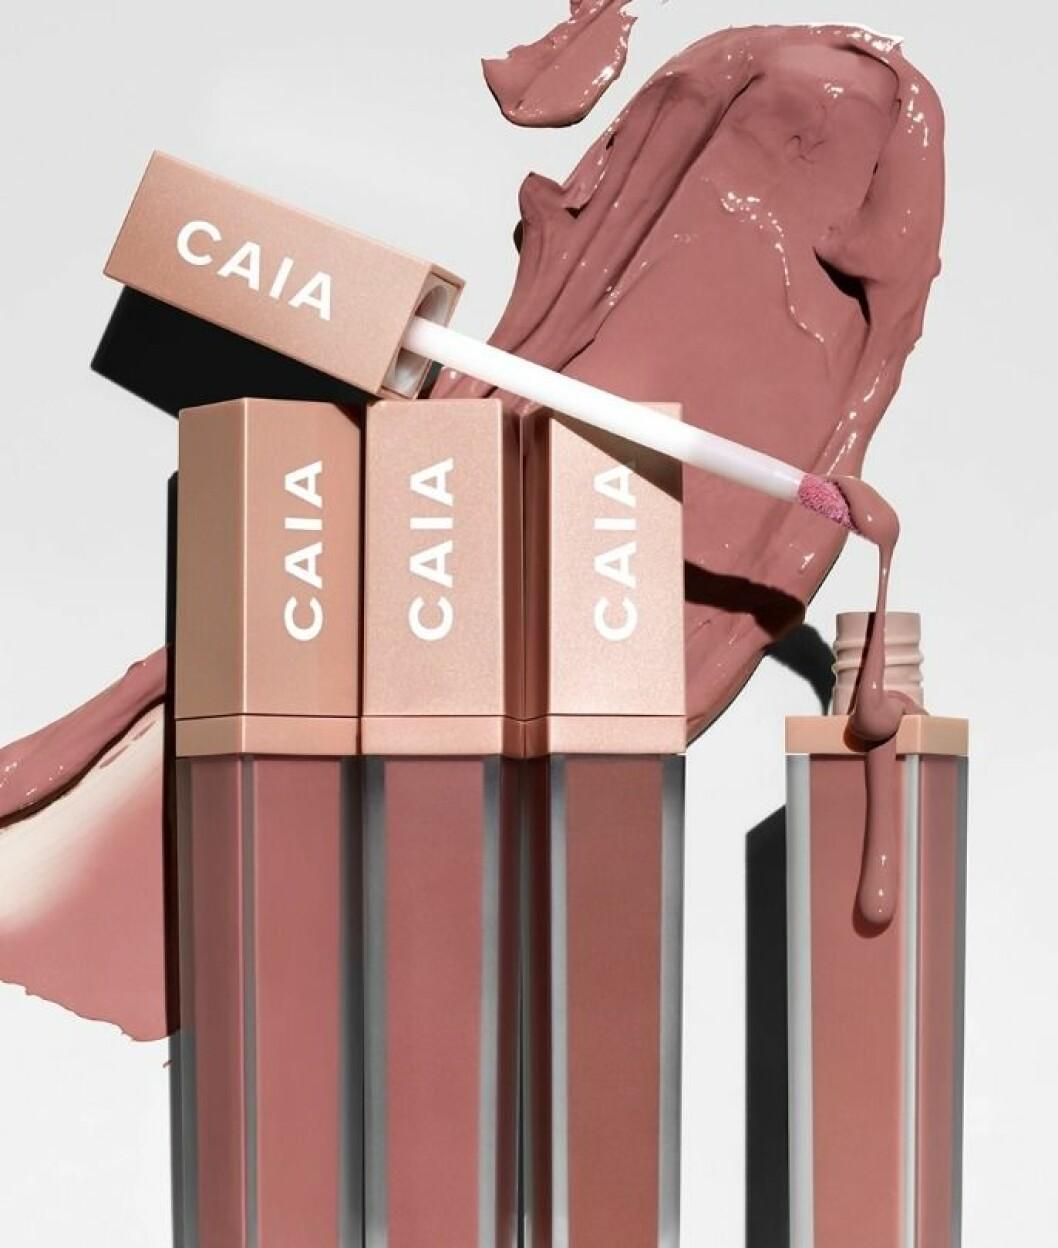 caia cosmetics lappstift kit